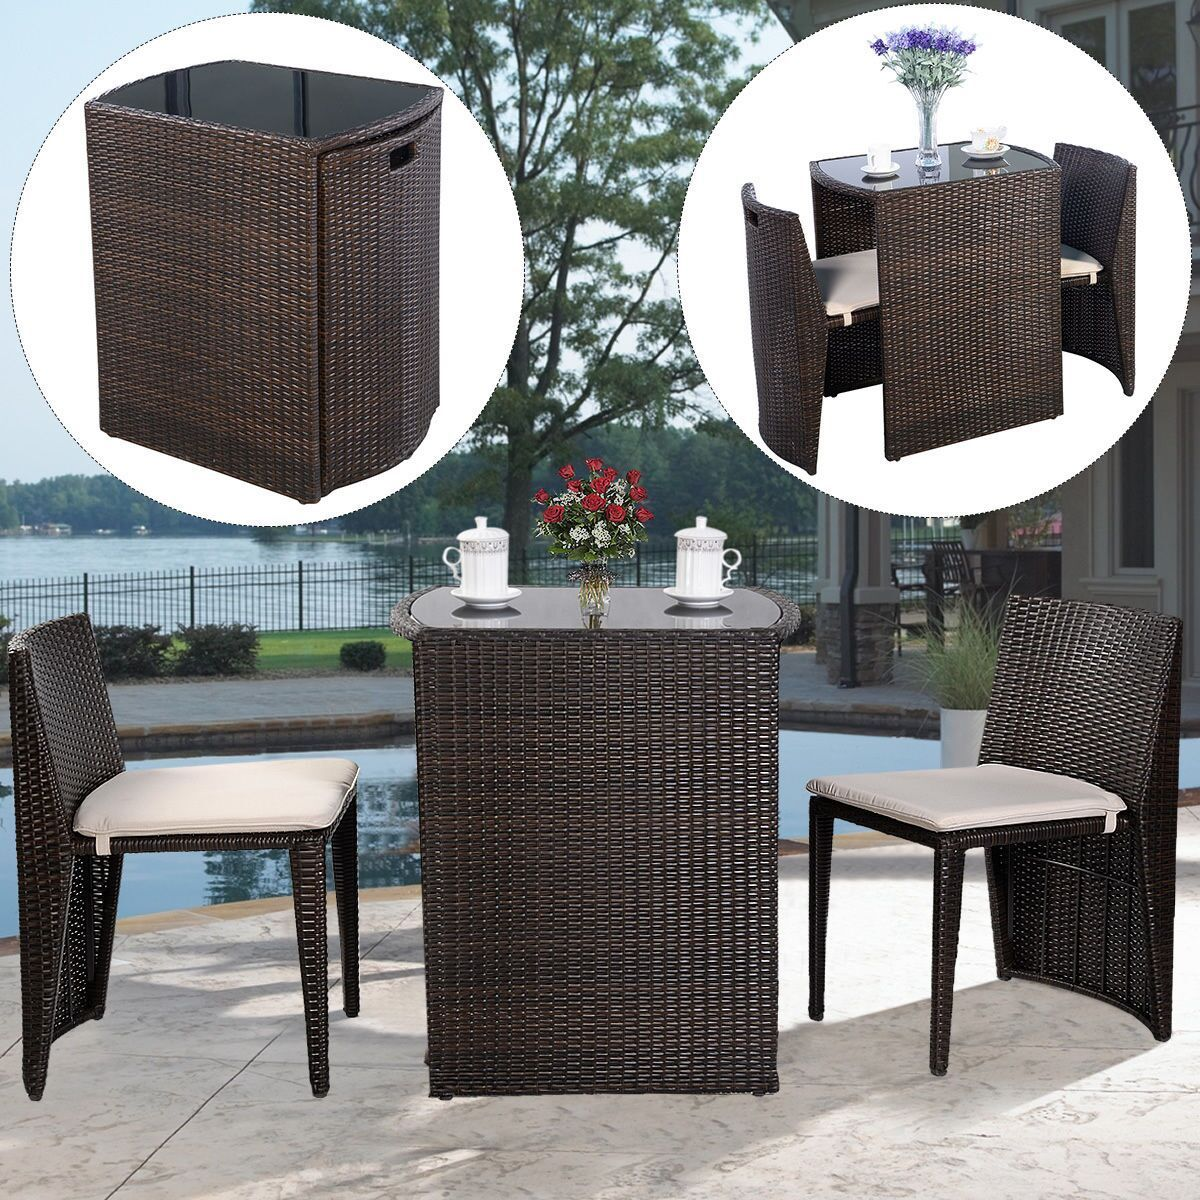 Costway 3 PCS Cushioned Outdoor Wicker Patio Set Garden Lawn Sofa Furniture Seat Brown